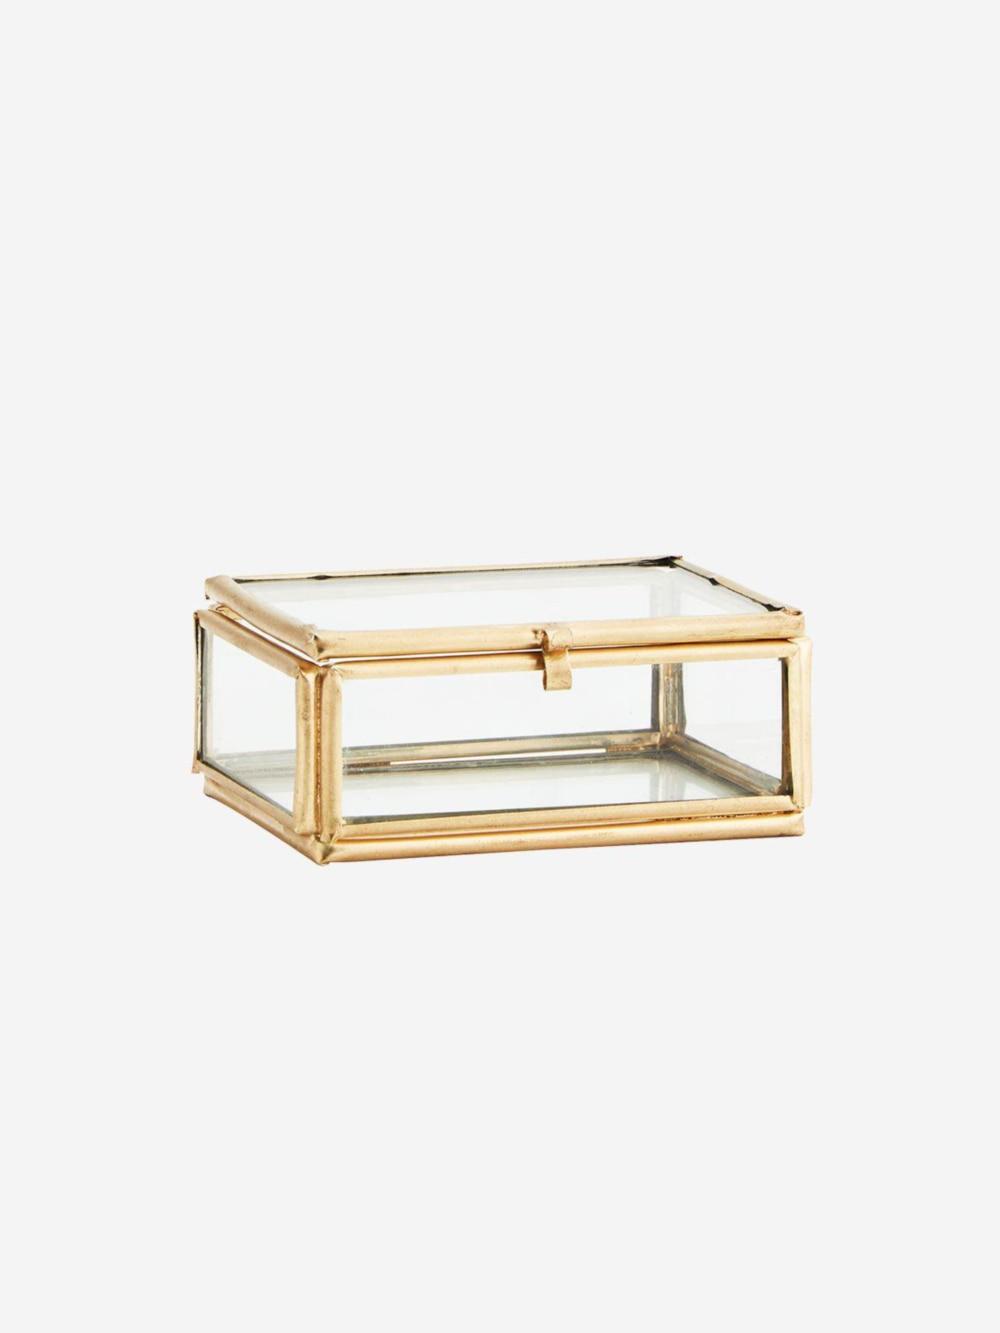 Joyero Espejo Basic II con acabados dorados